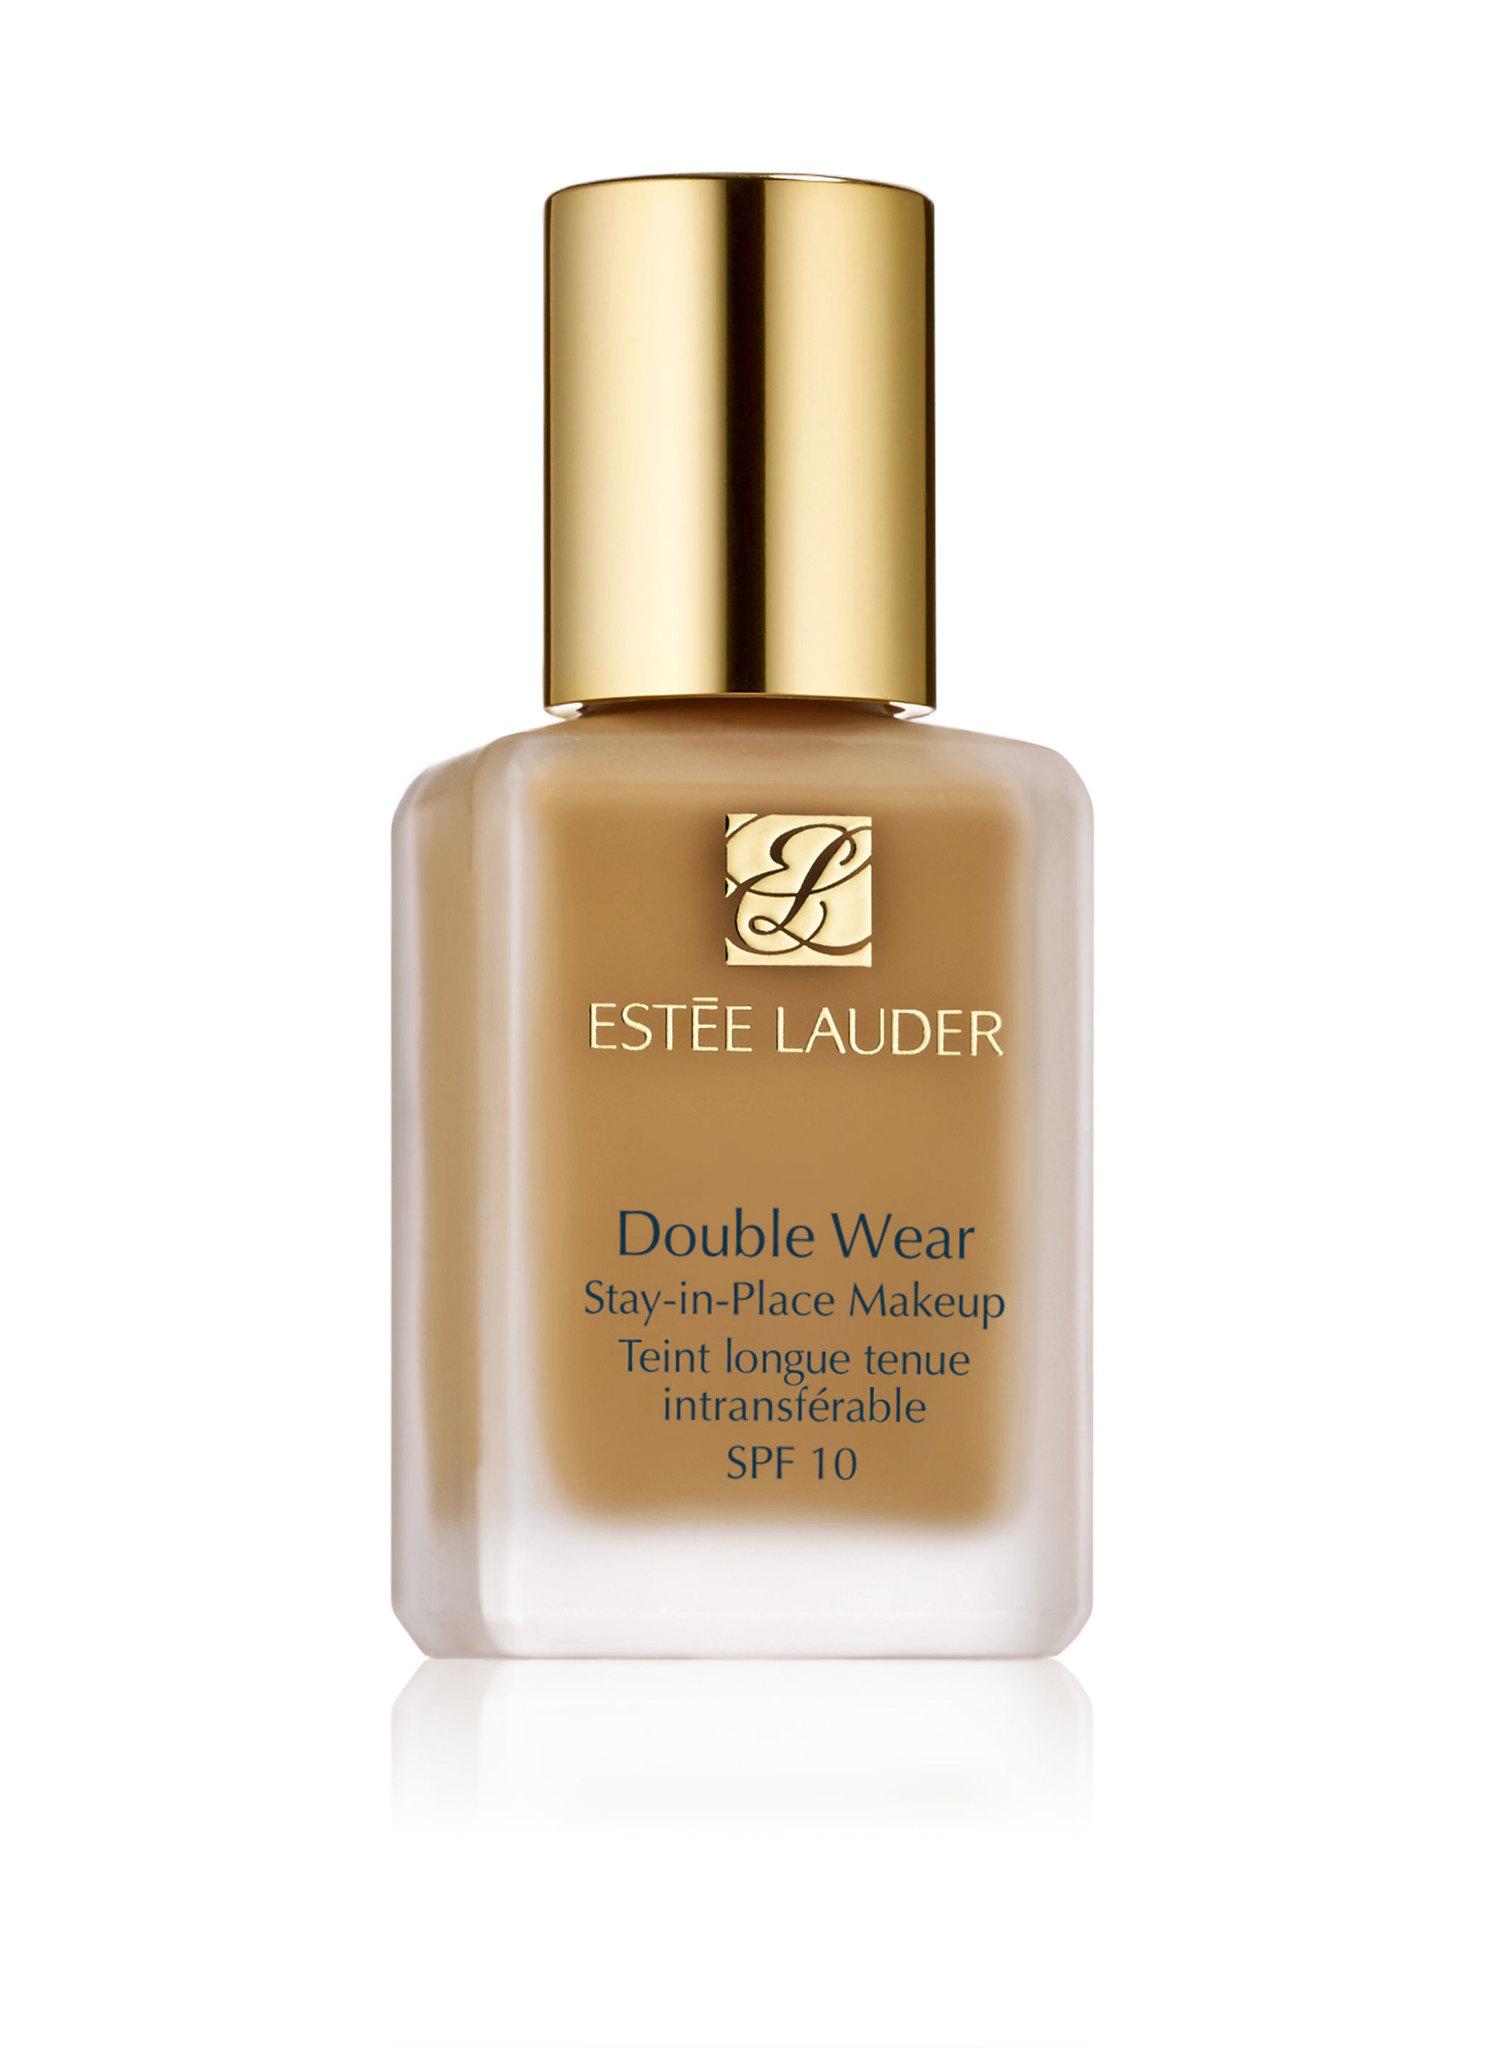 Estée Lauder Double Wear Stay-In-Place Makeup Foundation, 3N1 ivory beige